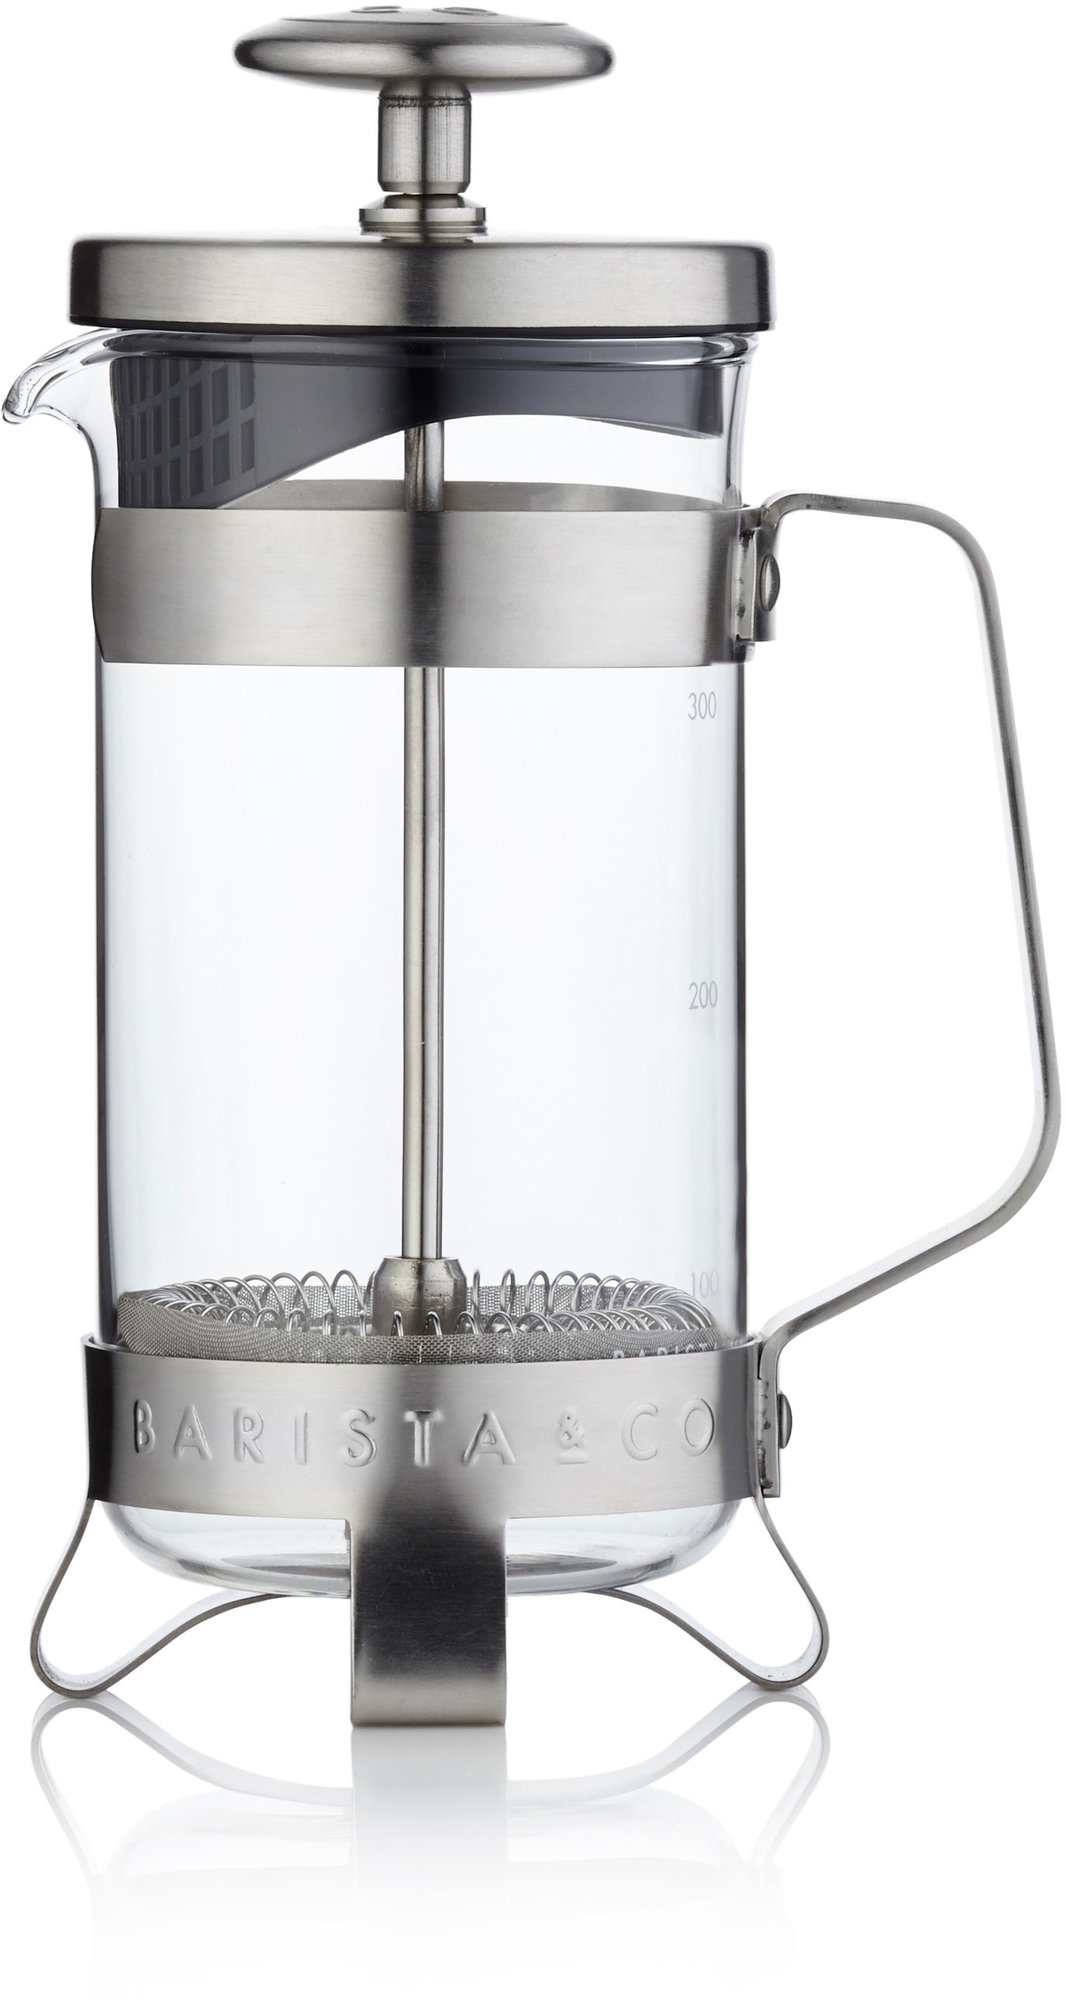 Barista & Co Stempelkanne børstet stål 3 kopper